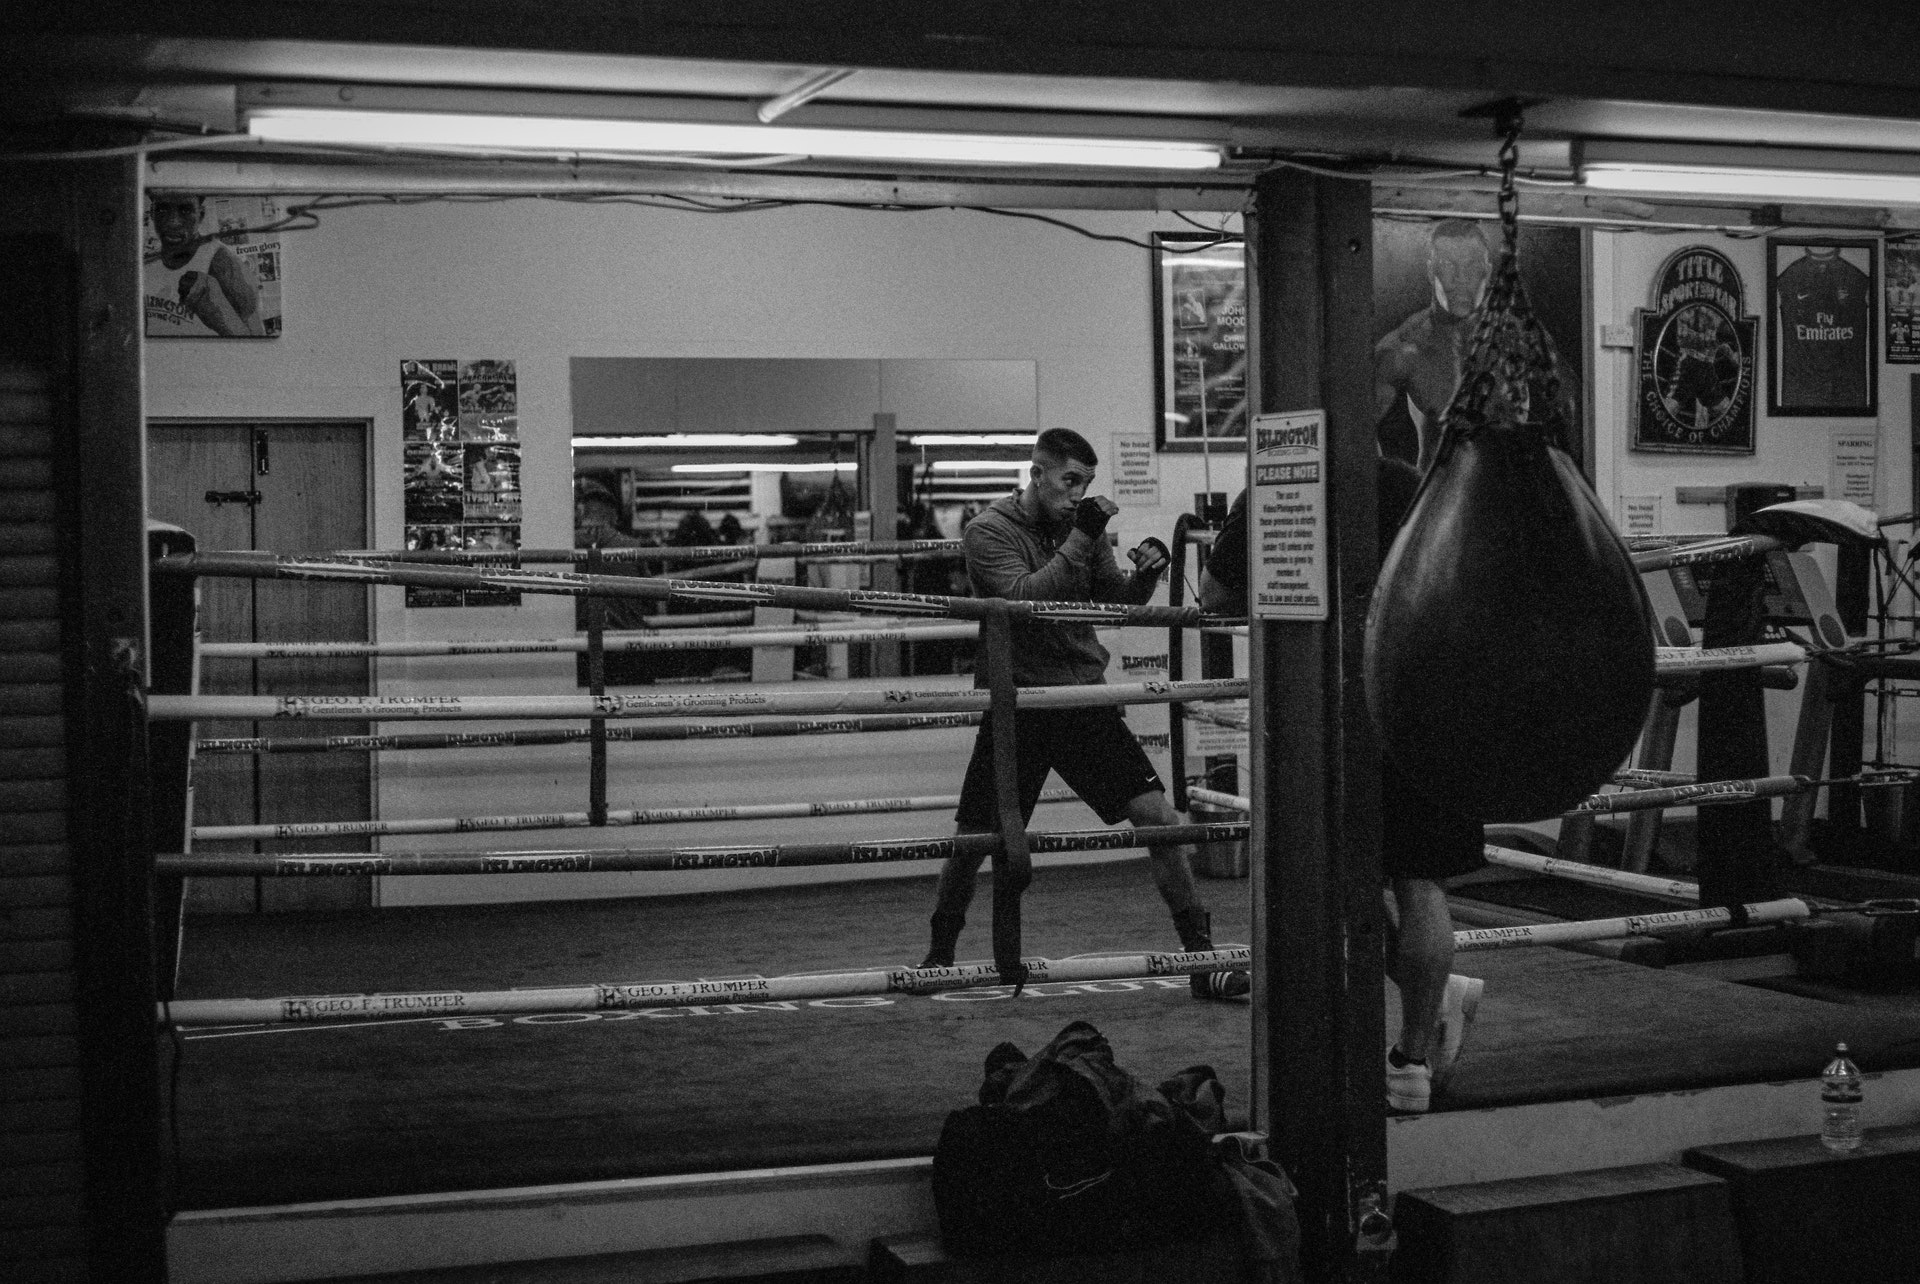 Islington_Boxing_Club-38